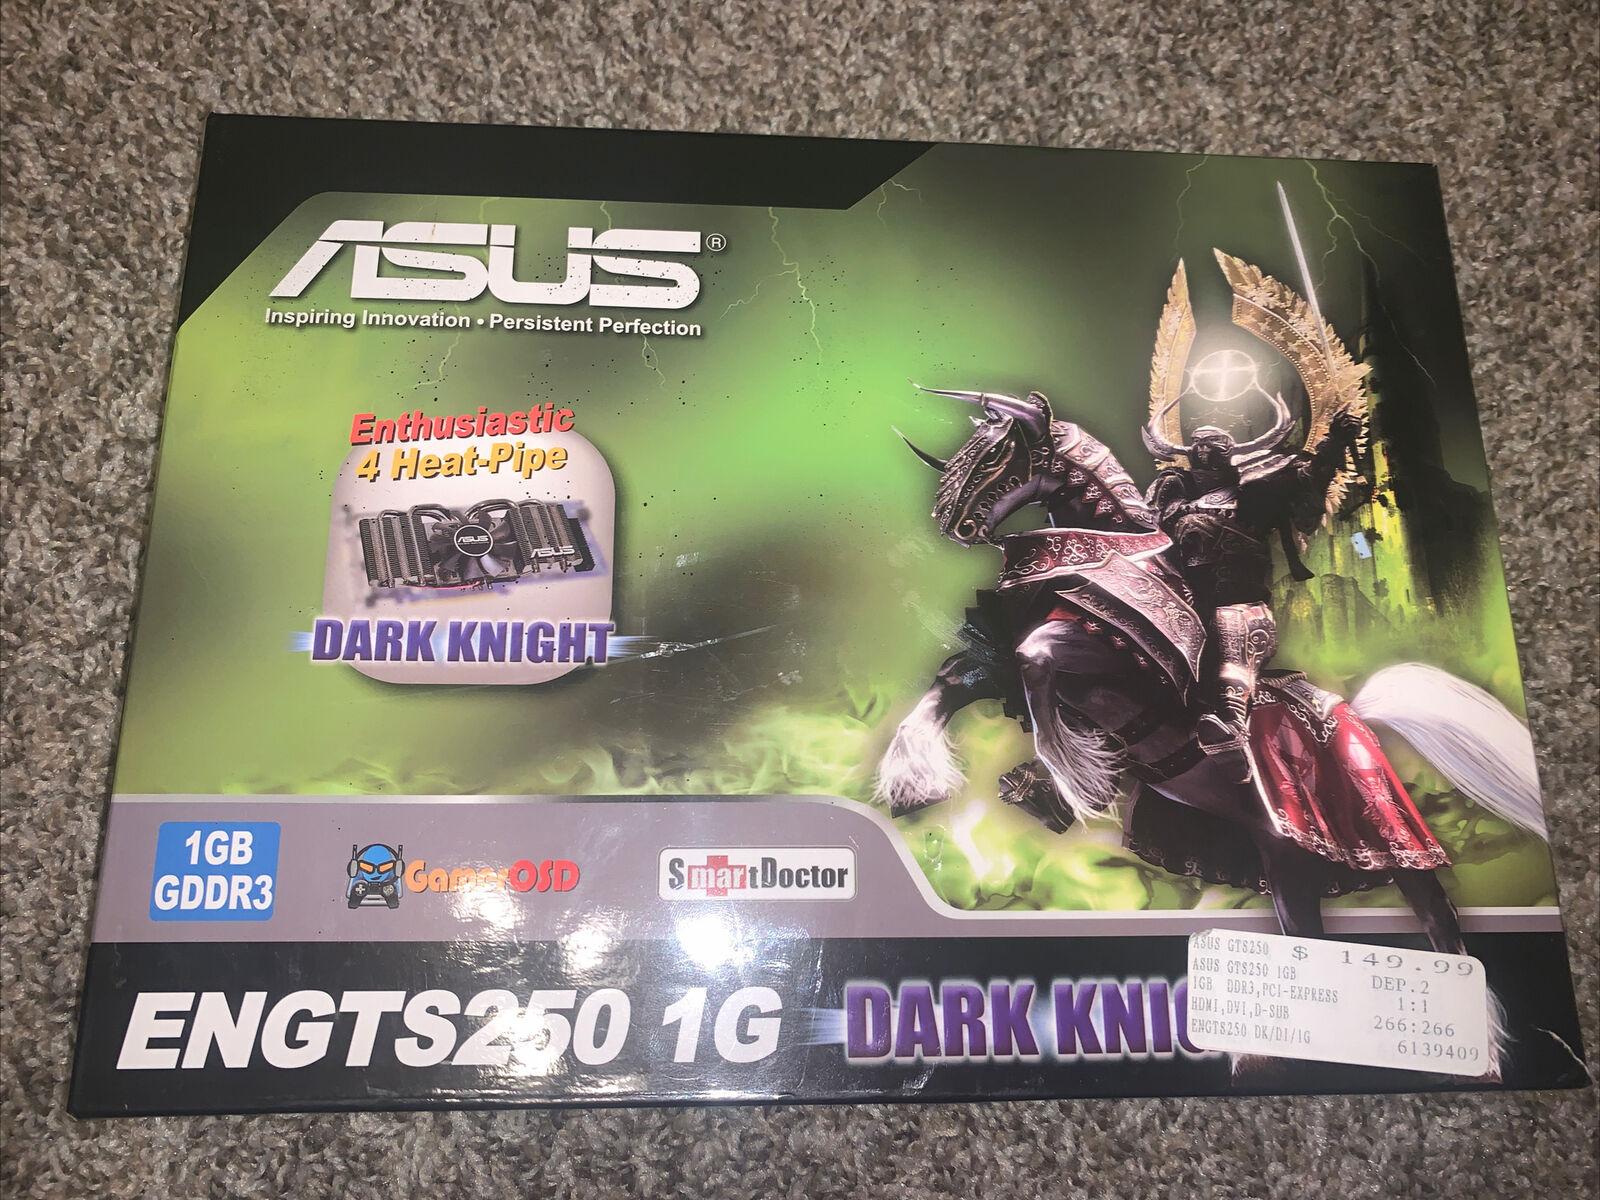 ASUS ENGTS250 DK/DI/1GD3/WW GeForce GTS 250 1GB GDDR3 PC Computer Graphics Card